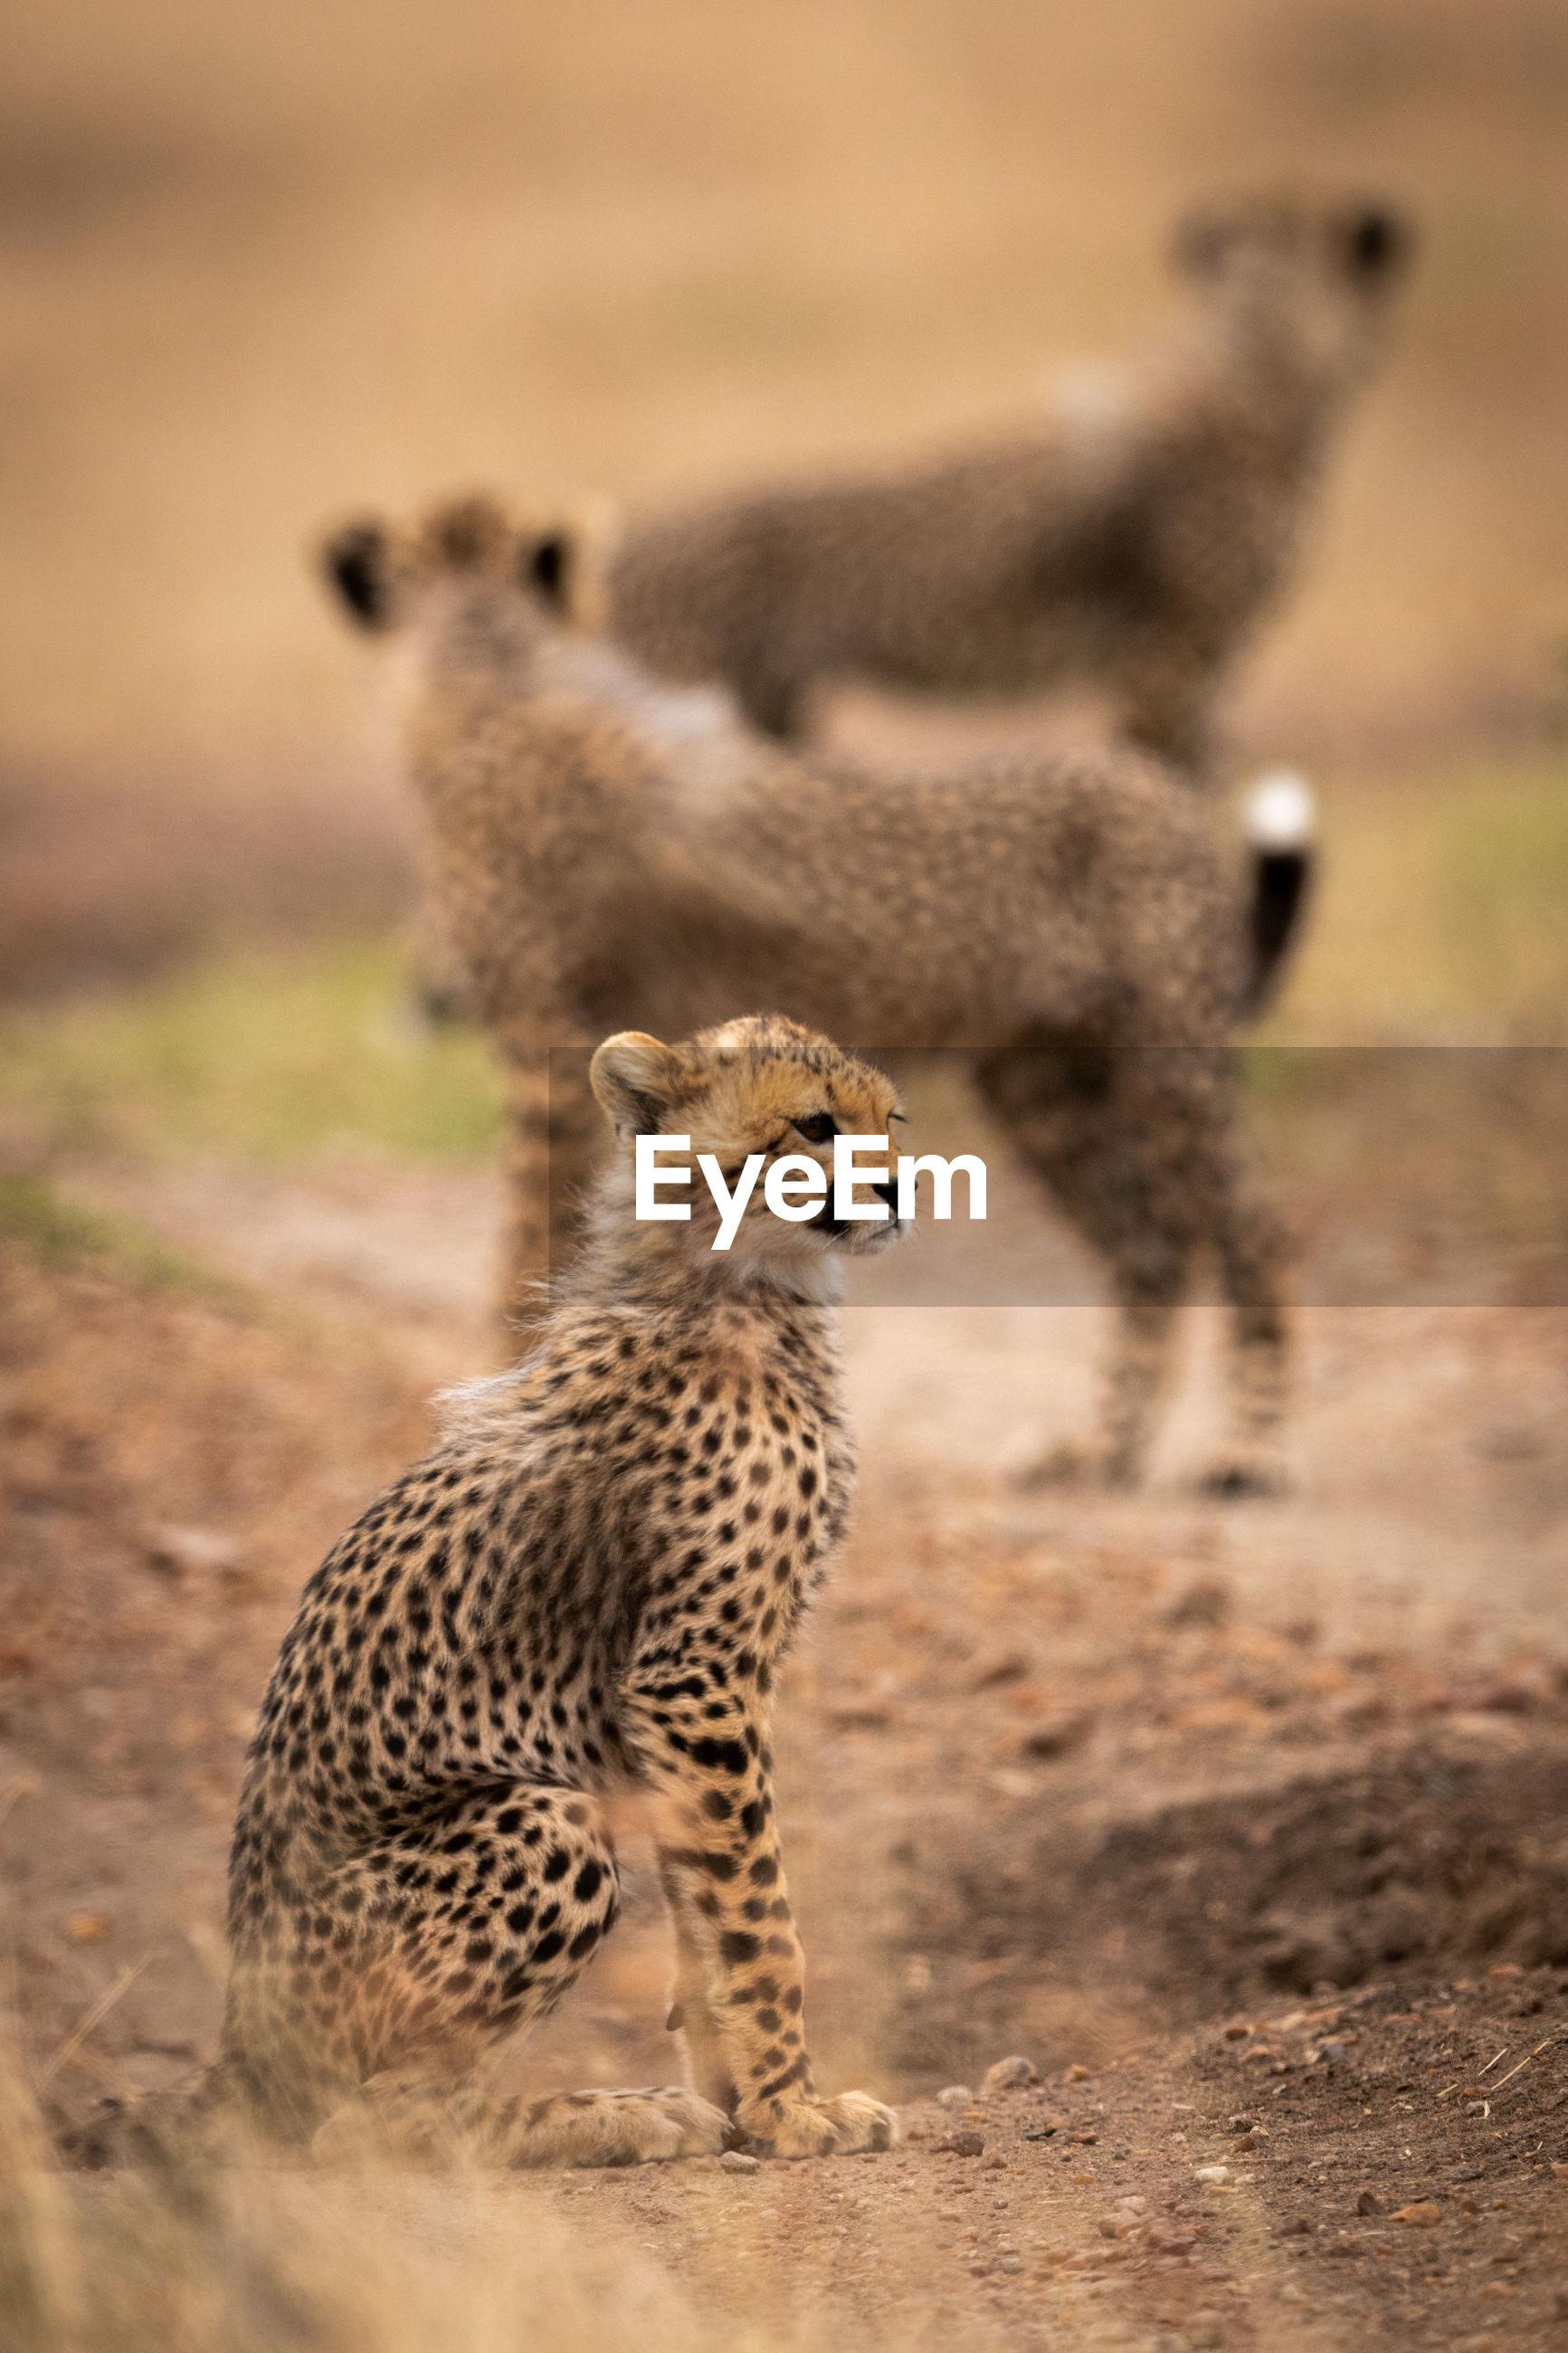 Cheetahs on field